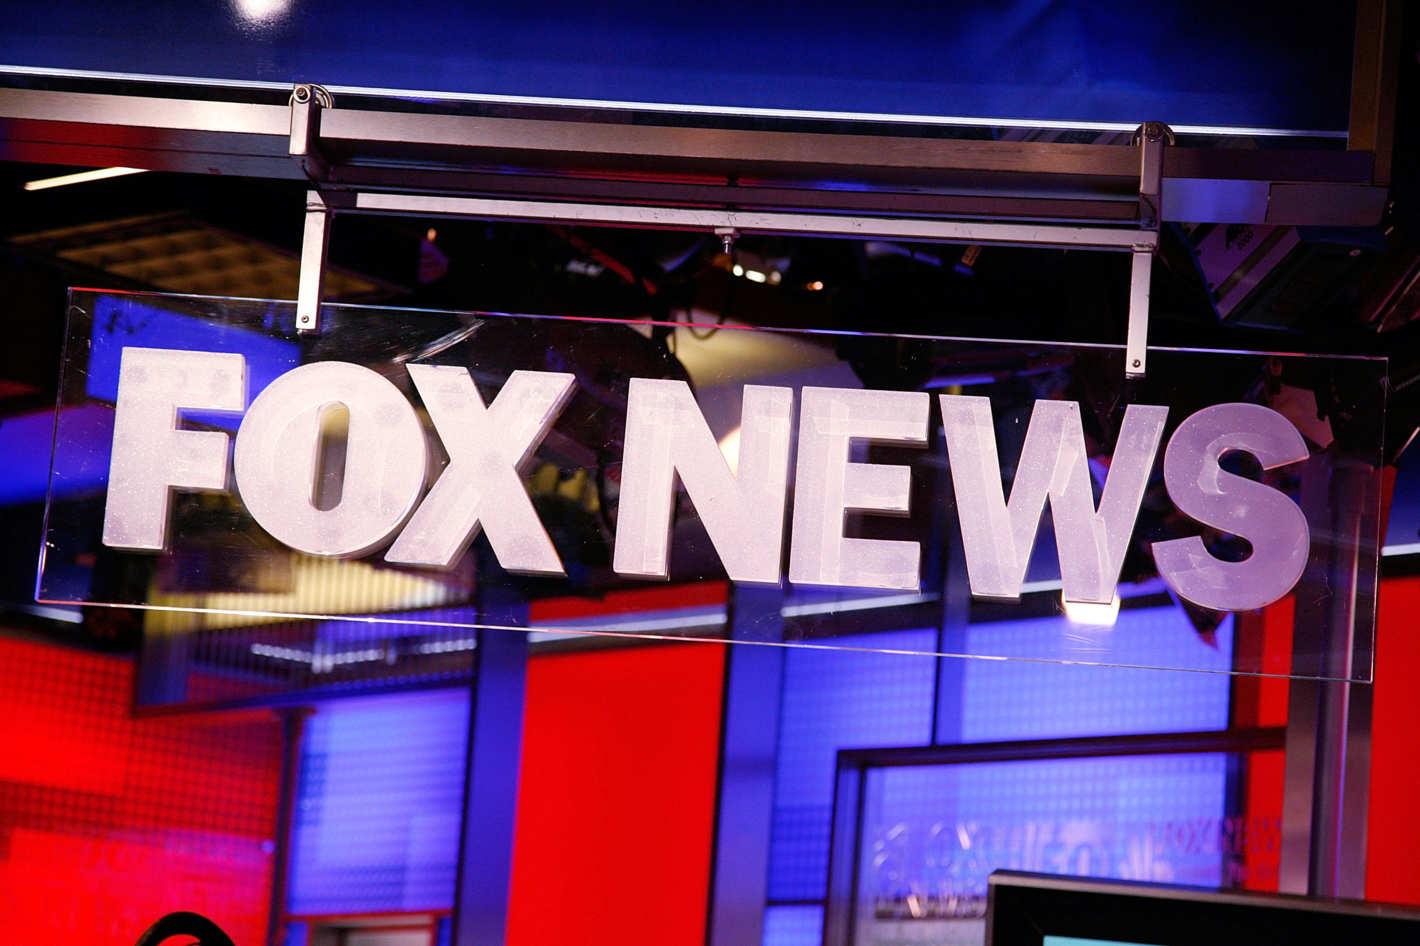 Image inside the Fox News studio